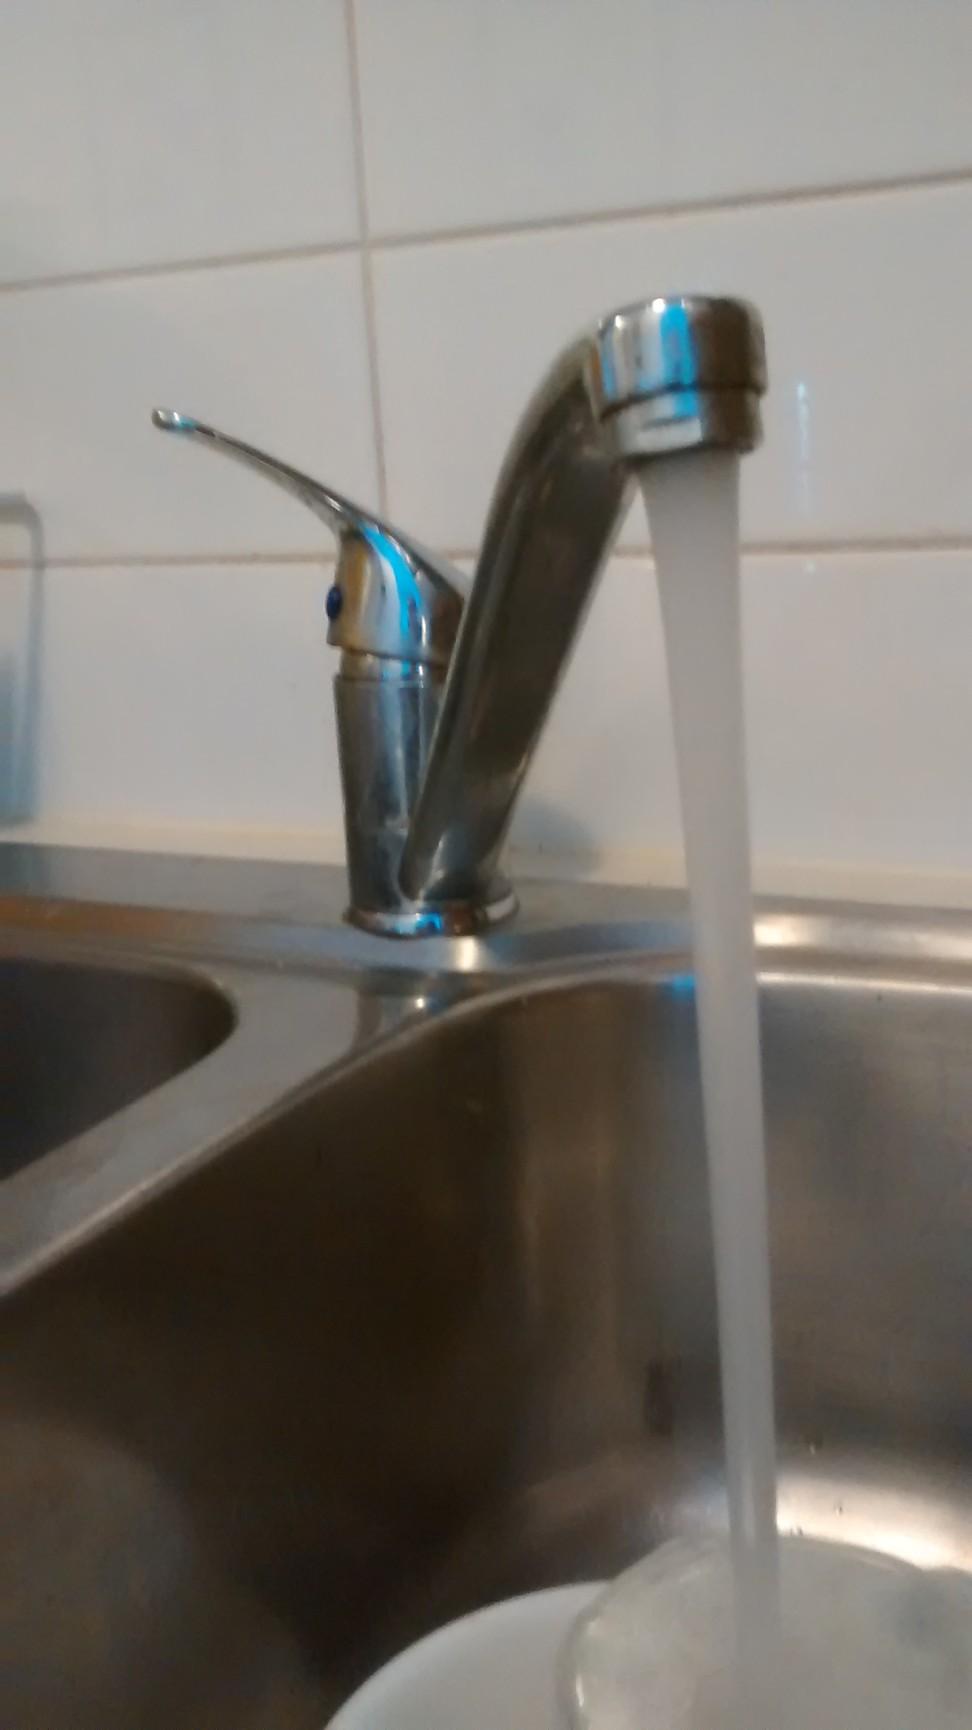 town water tap